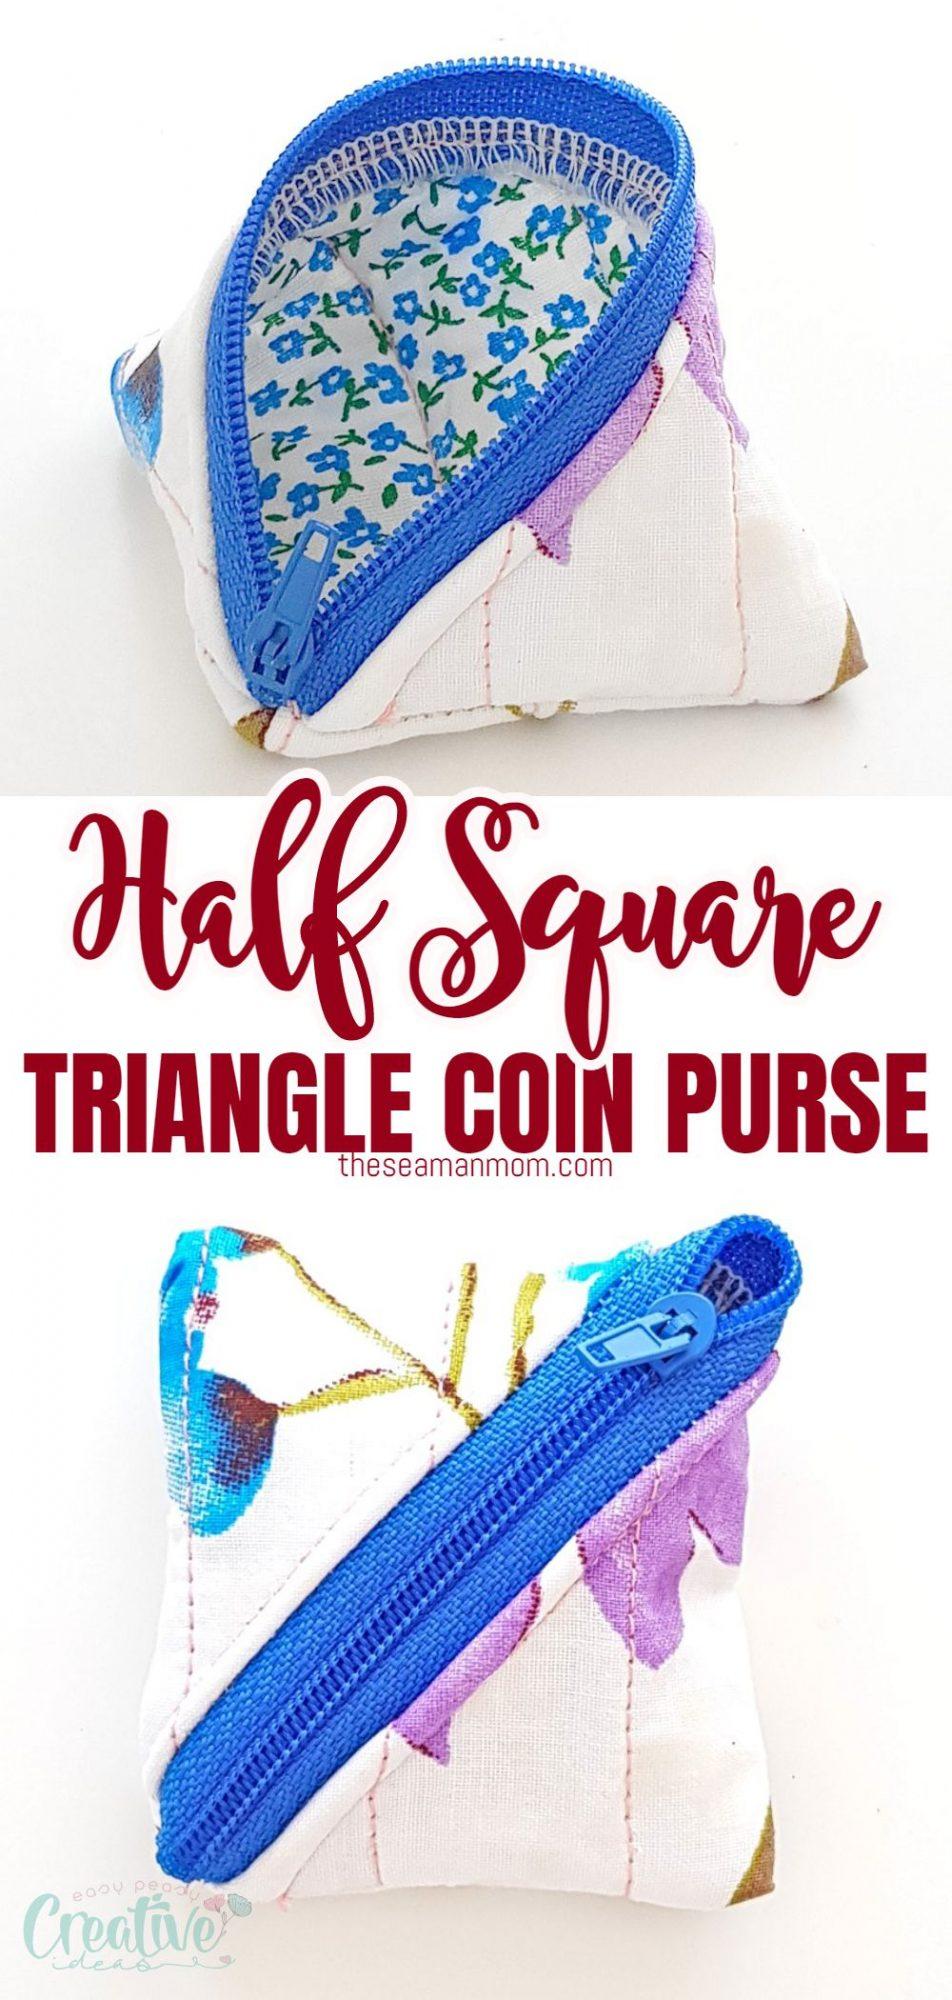 Zipper coin purse